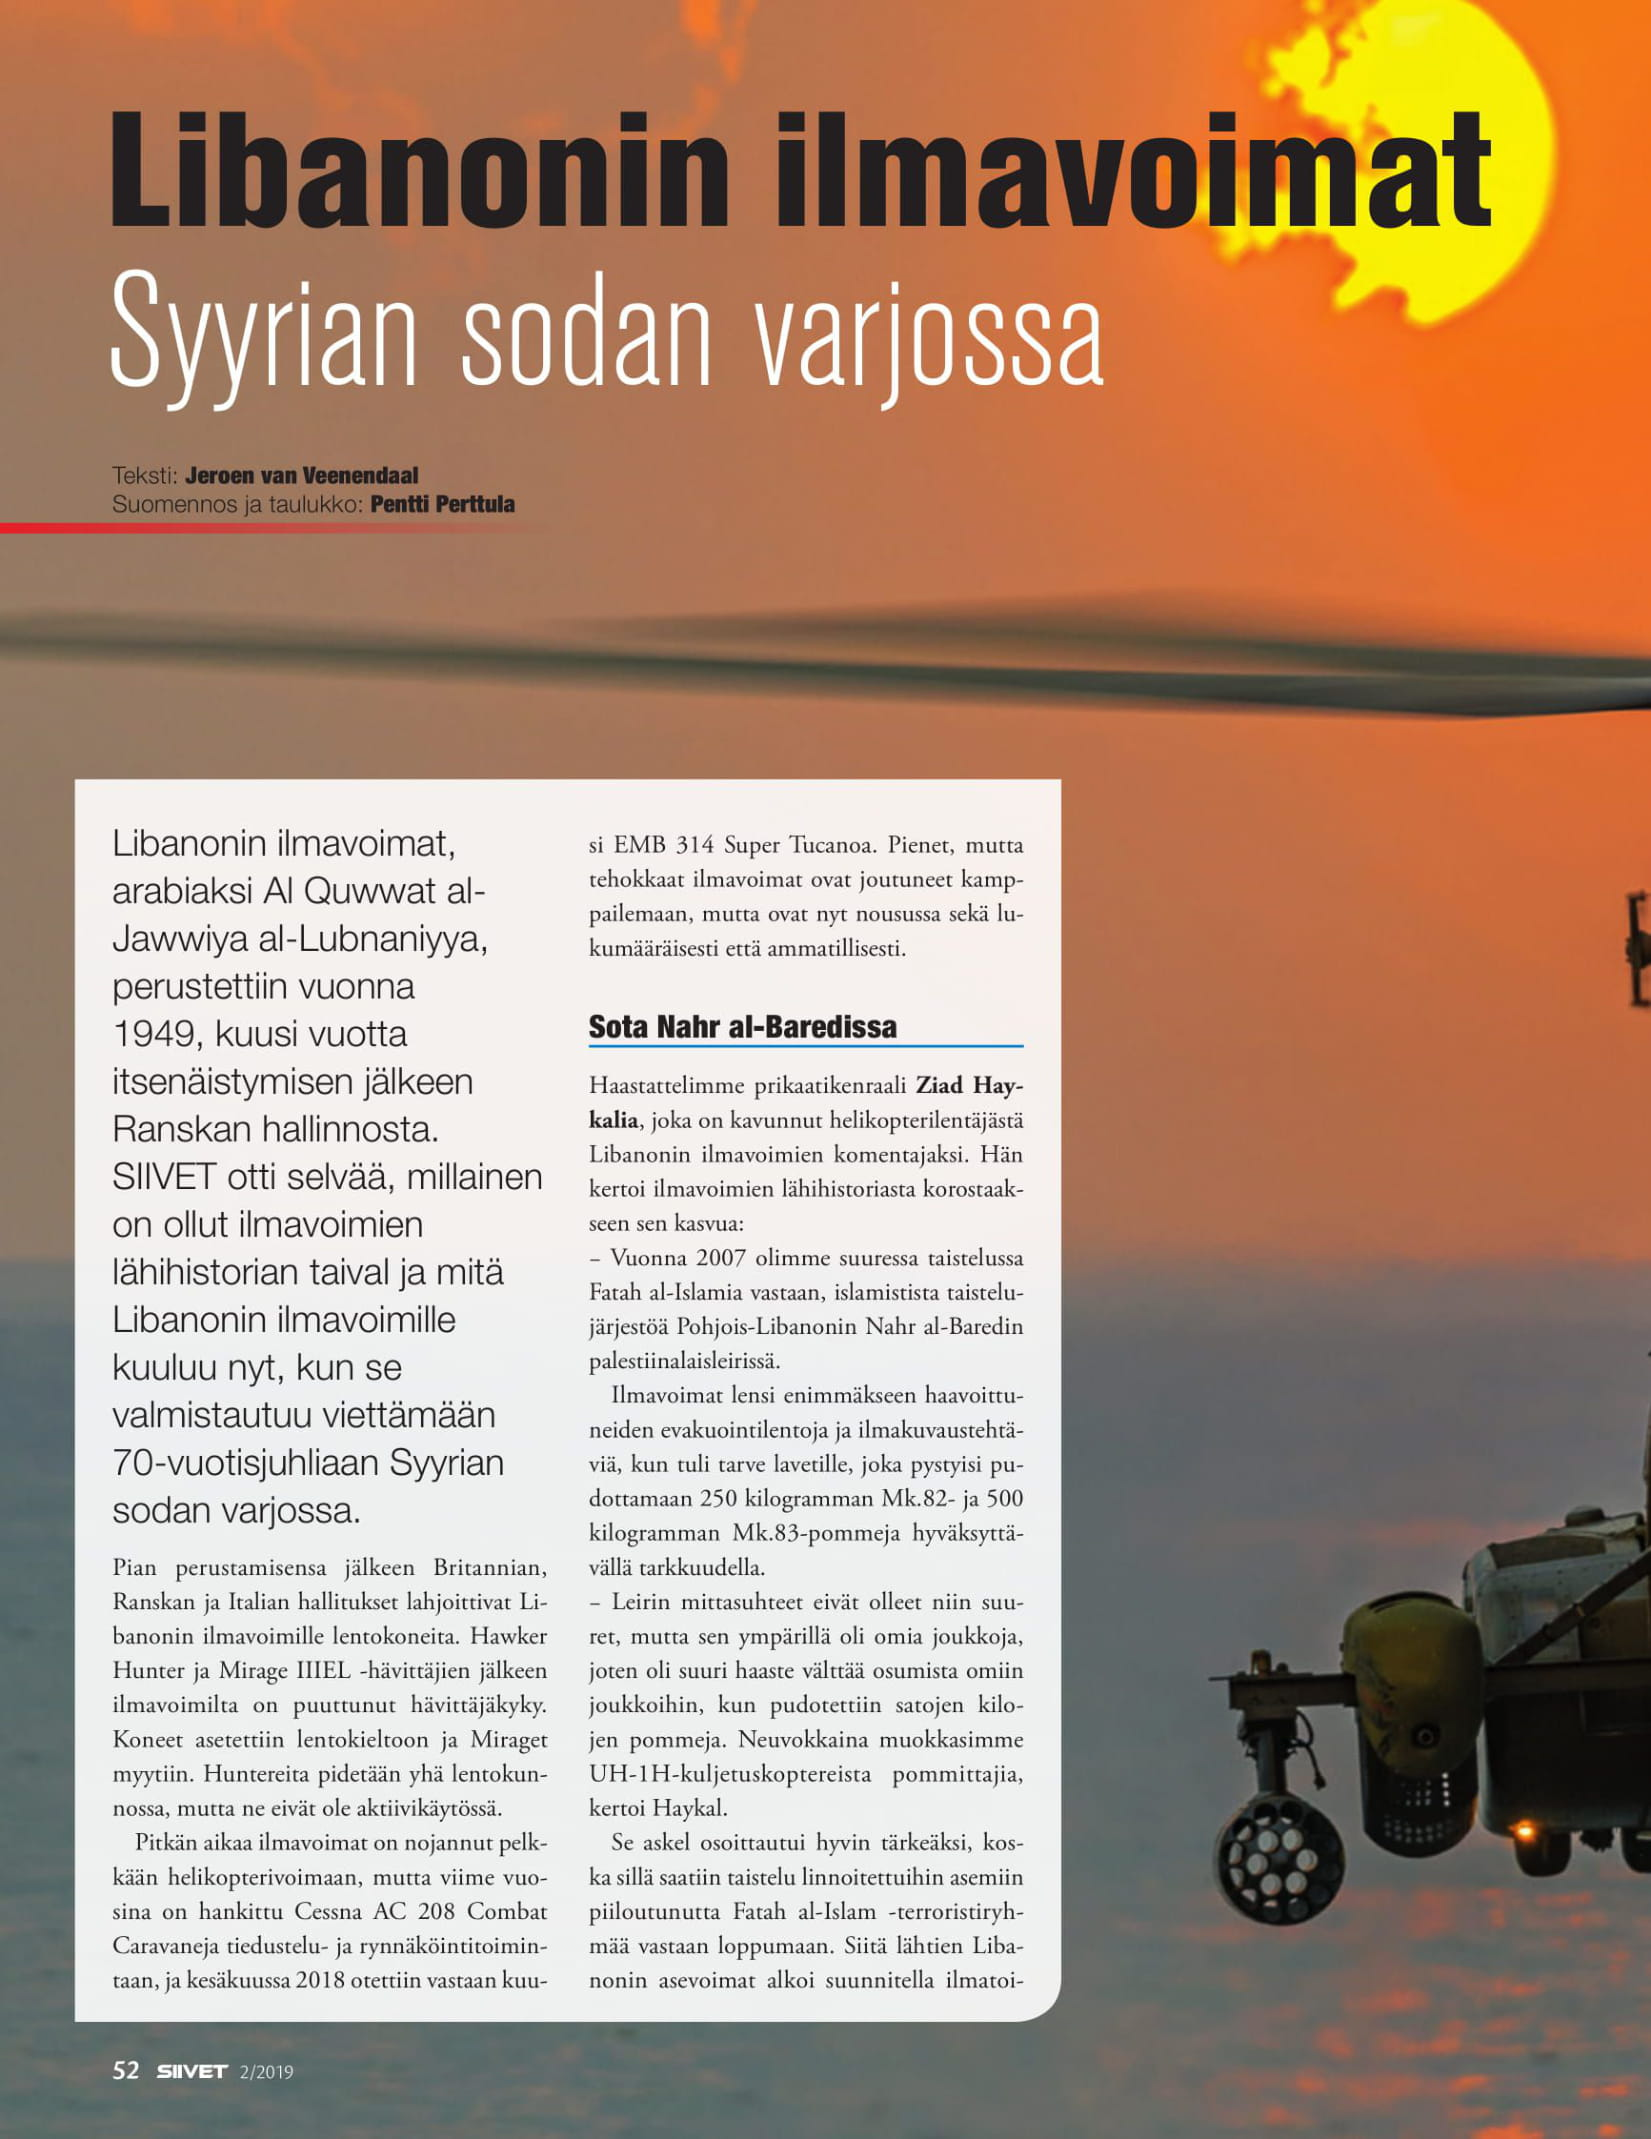 Siivet (Finland)_Lebanese Air Force-2